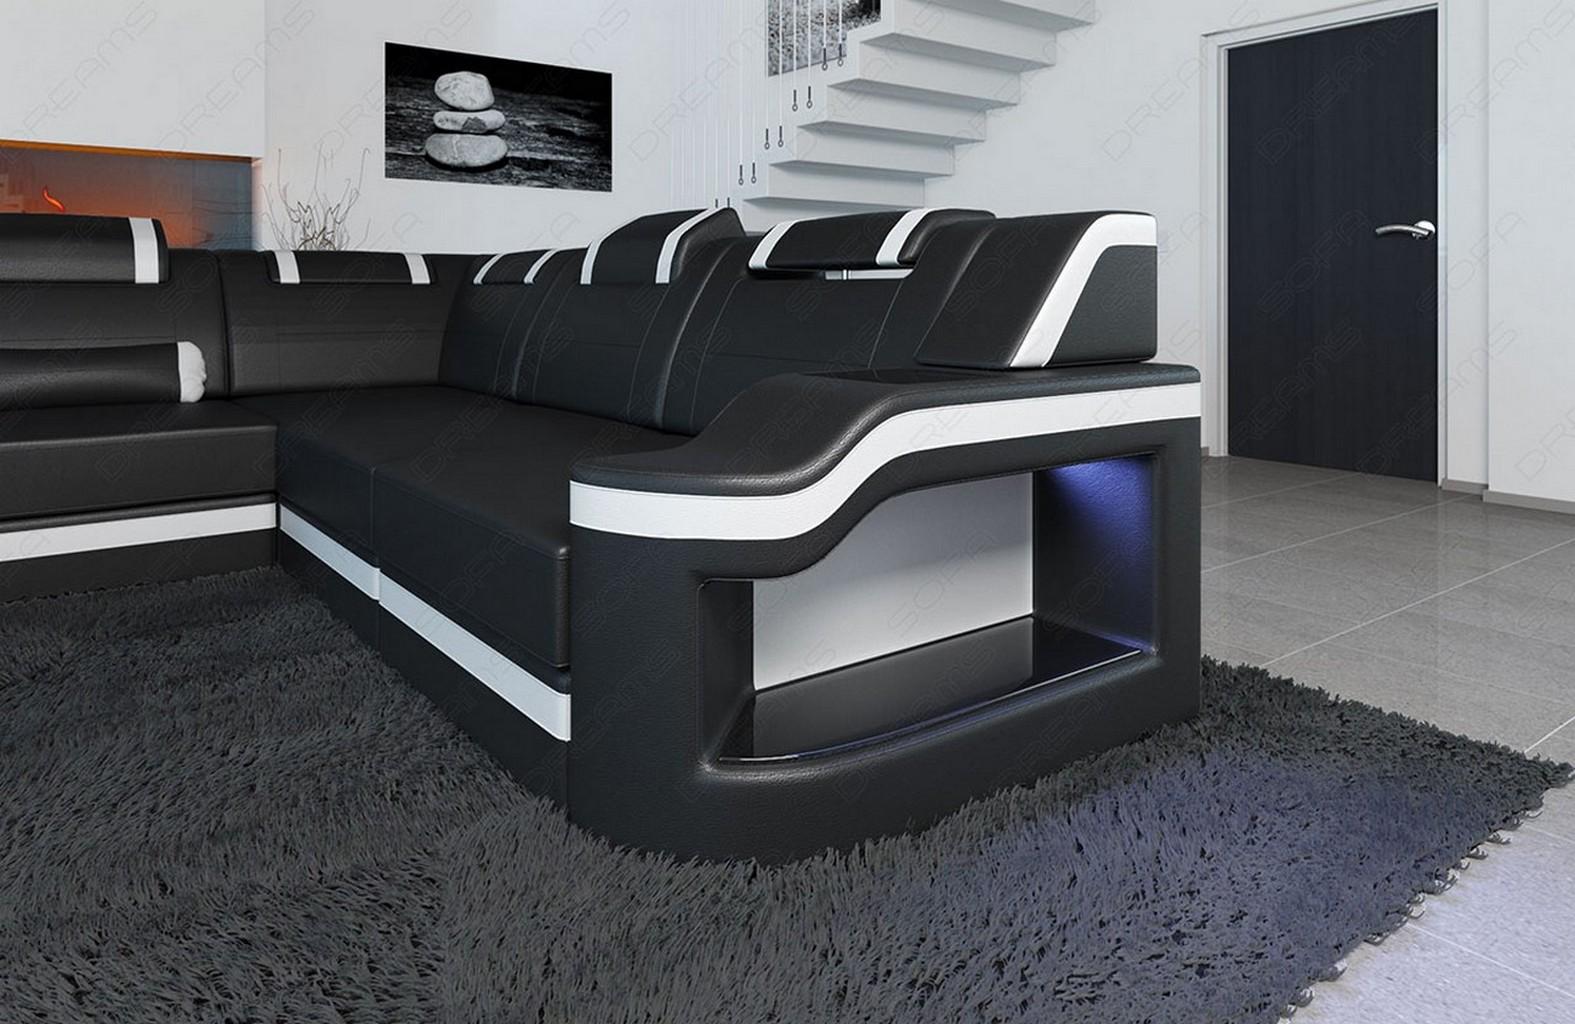 megacouch wohnlandschaft palermo xxl inkl led beleuchtung schwarz weiss ebay. Black Bedroom Furniture Sets. Home Design Ideas